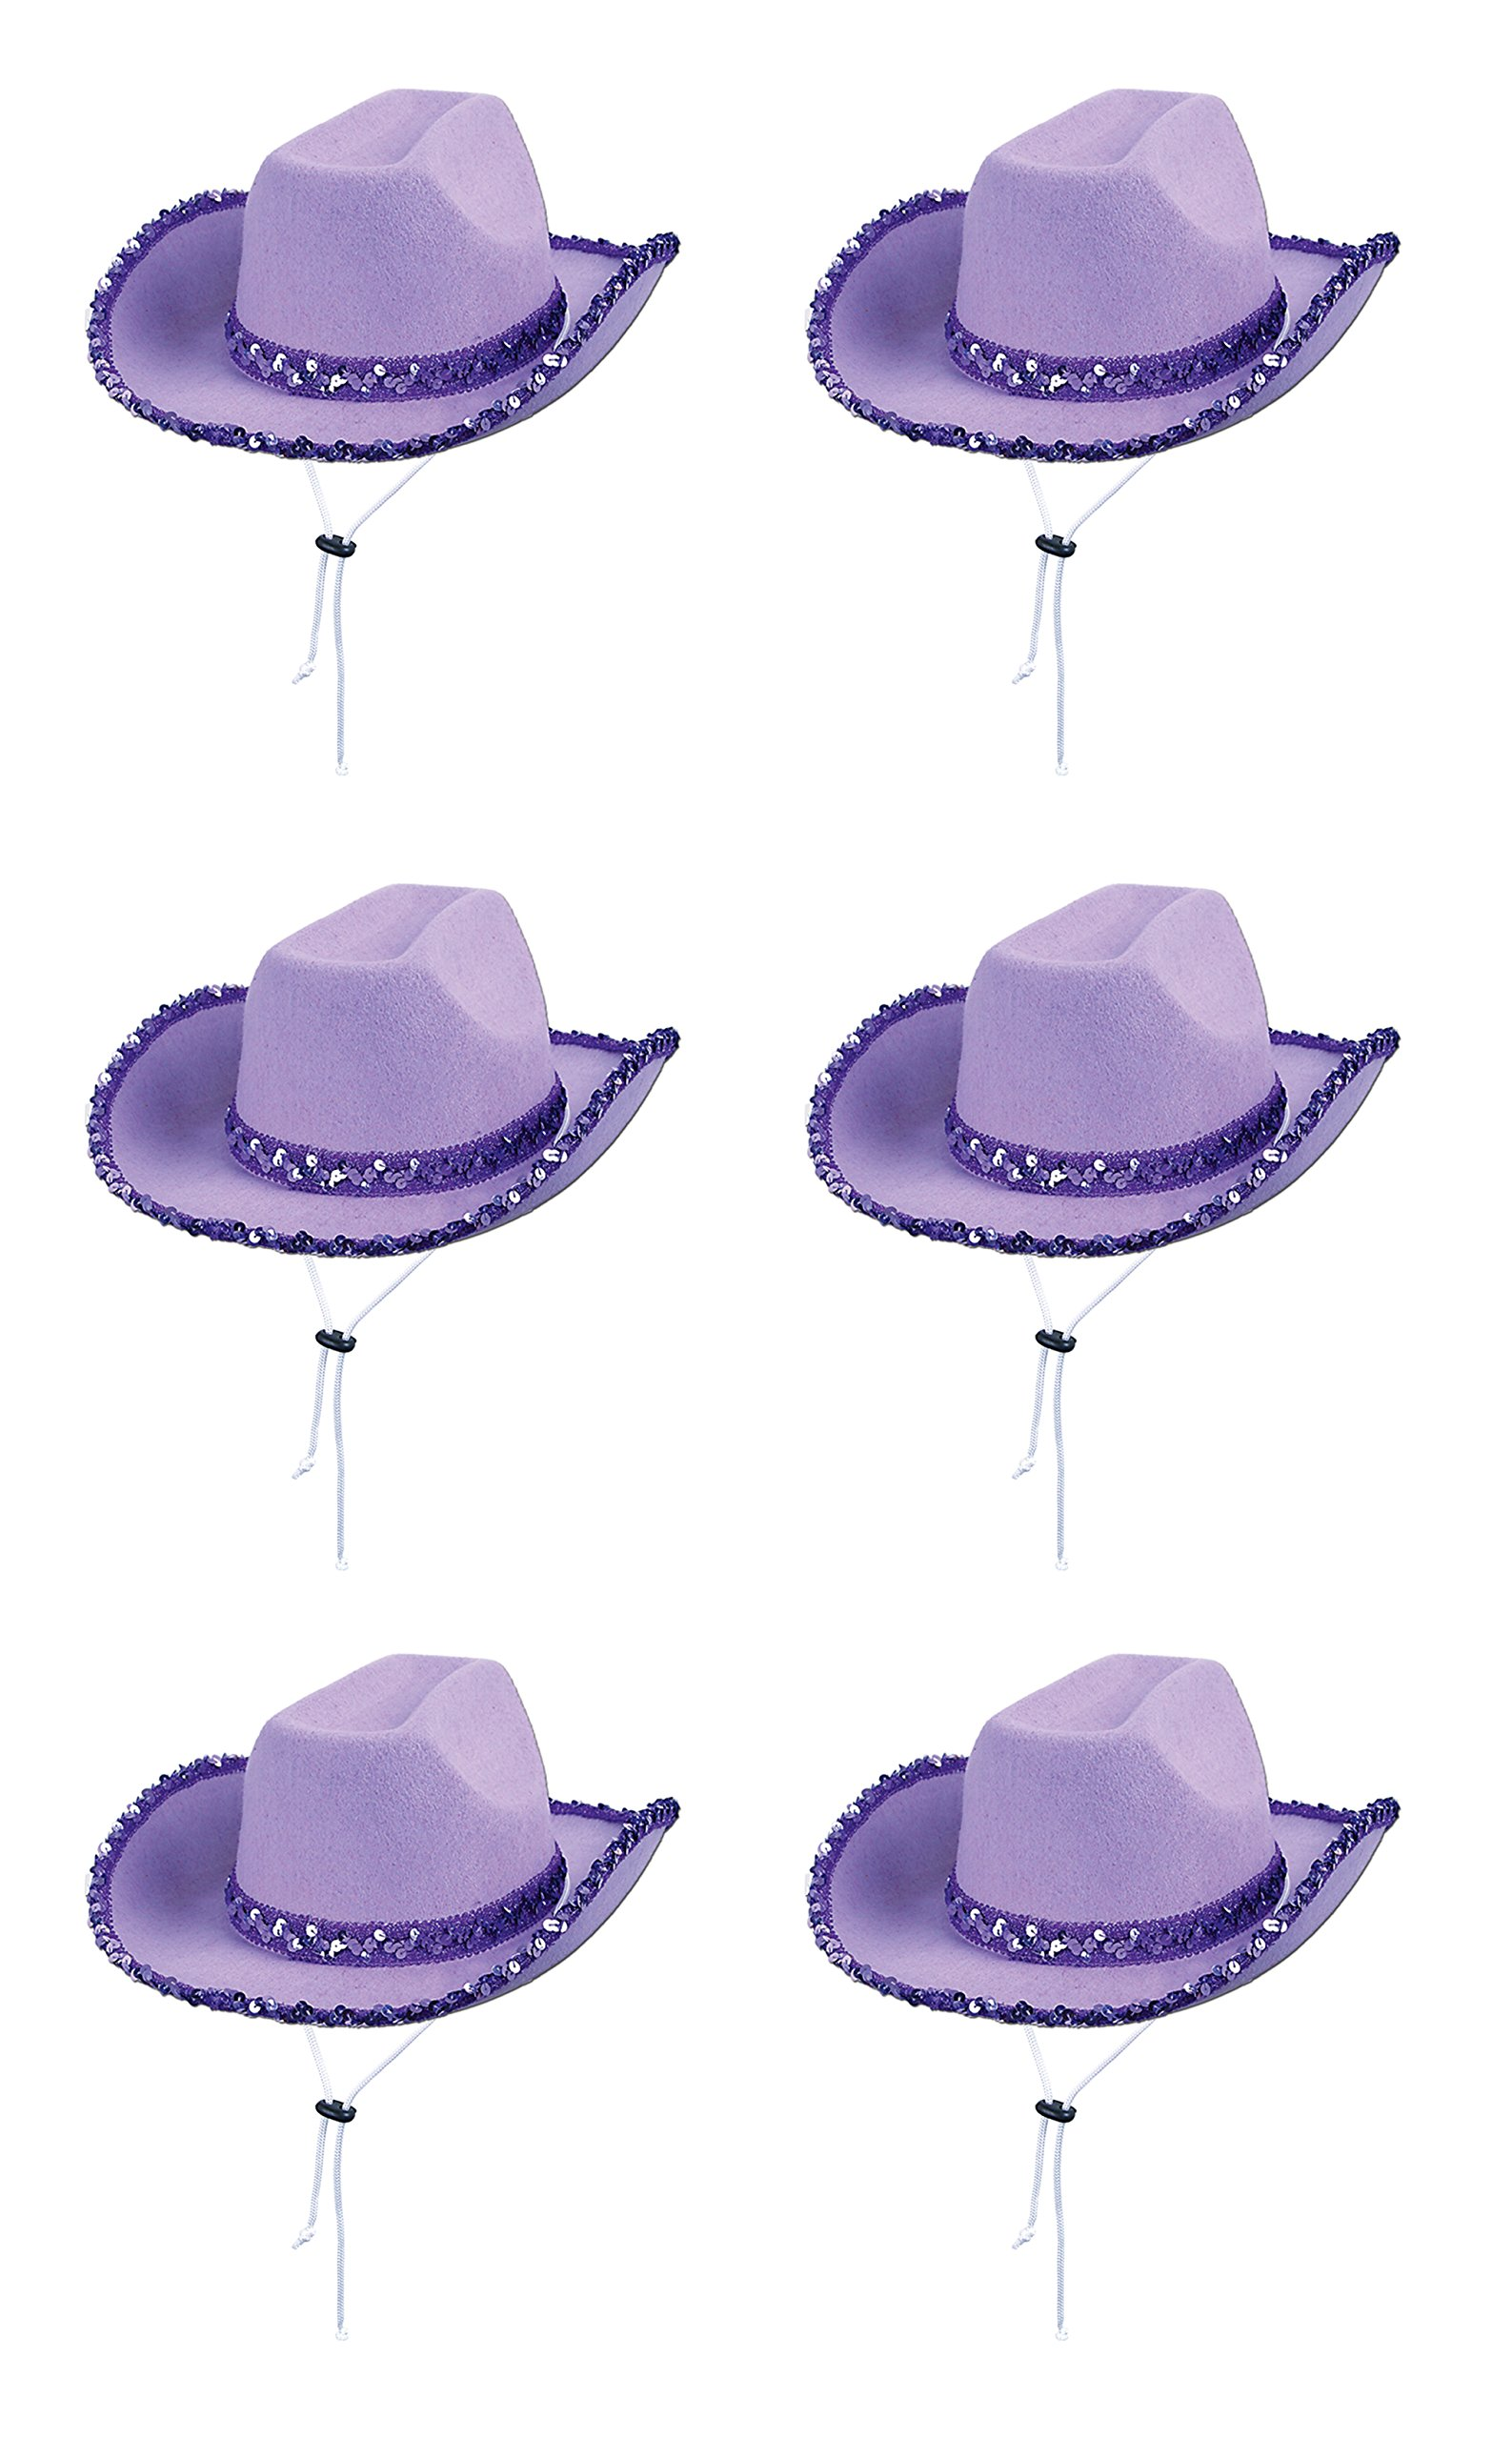 Beistle 60258 6-Piece Sequin Cowgirl Hat